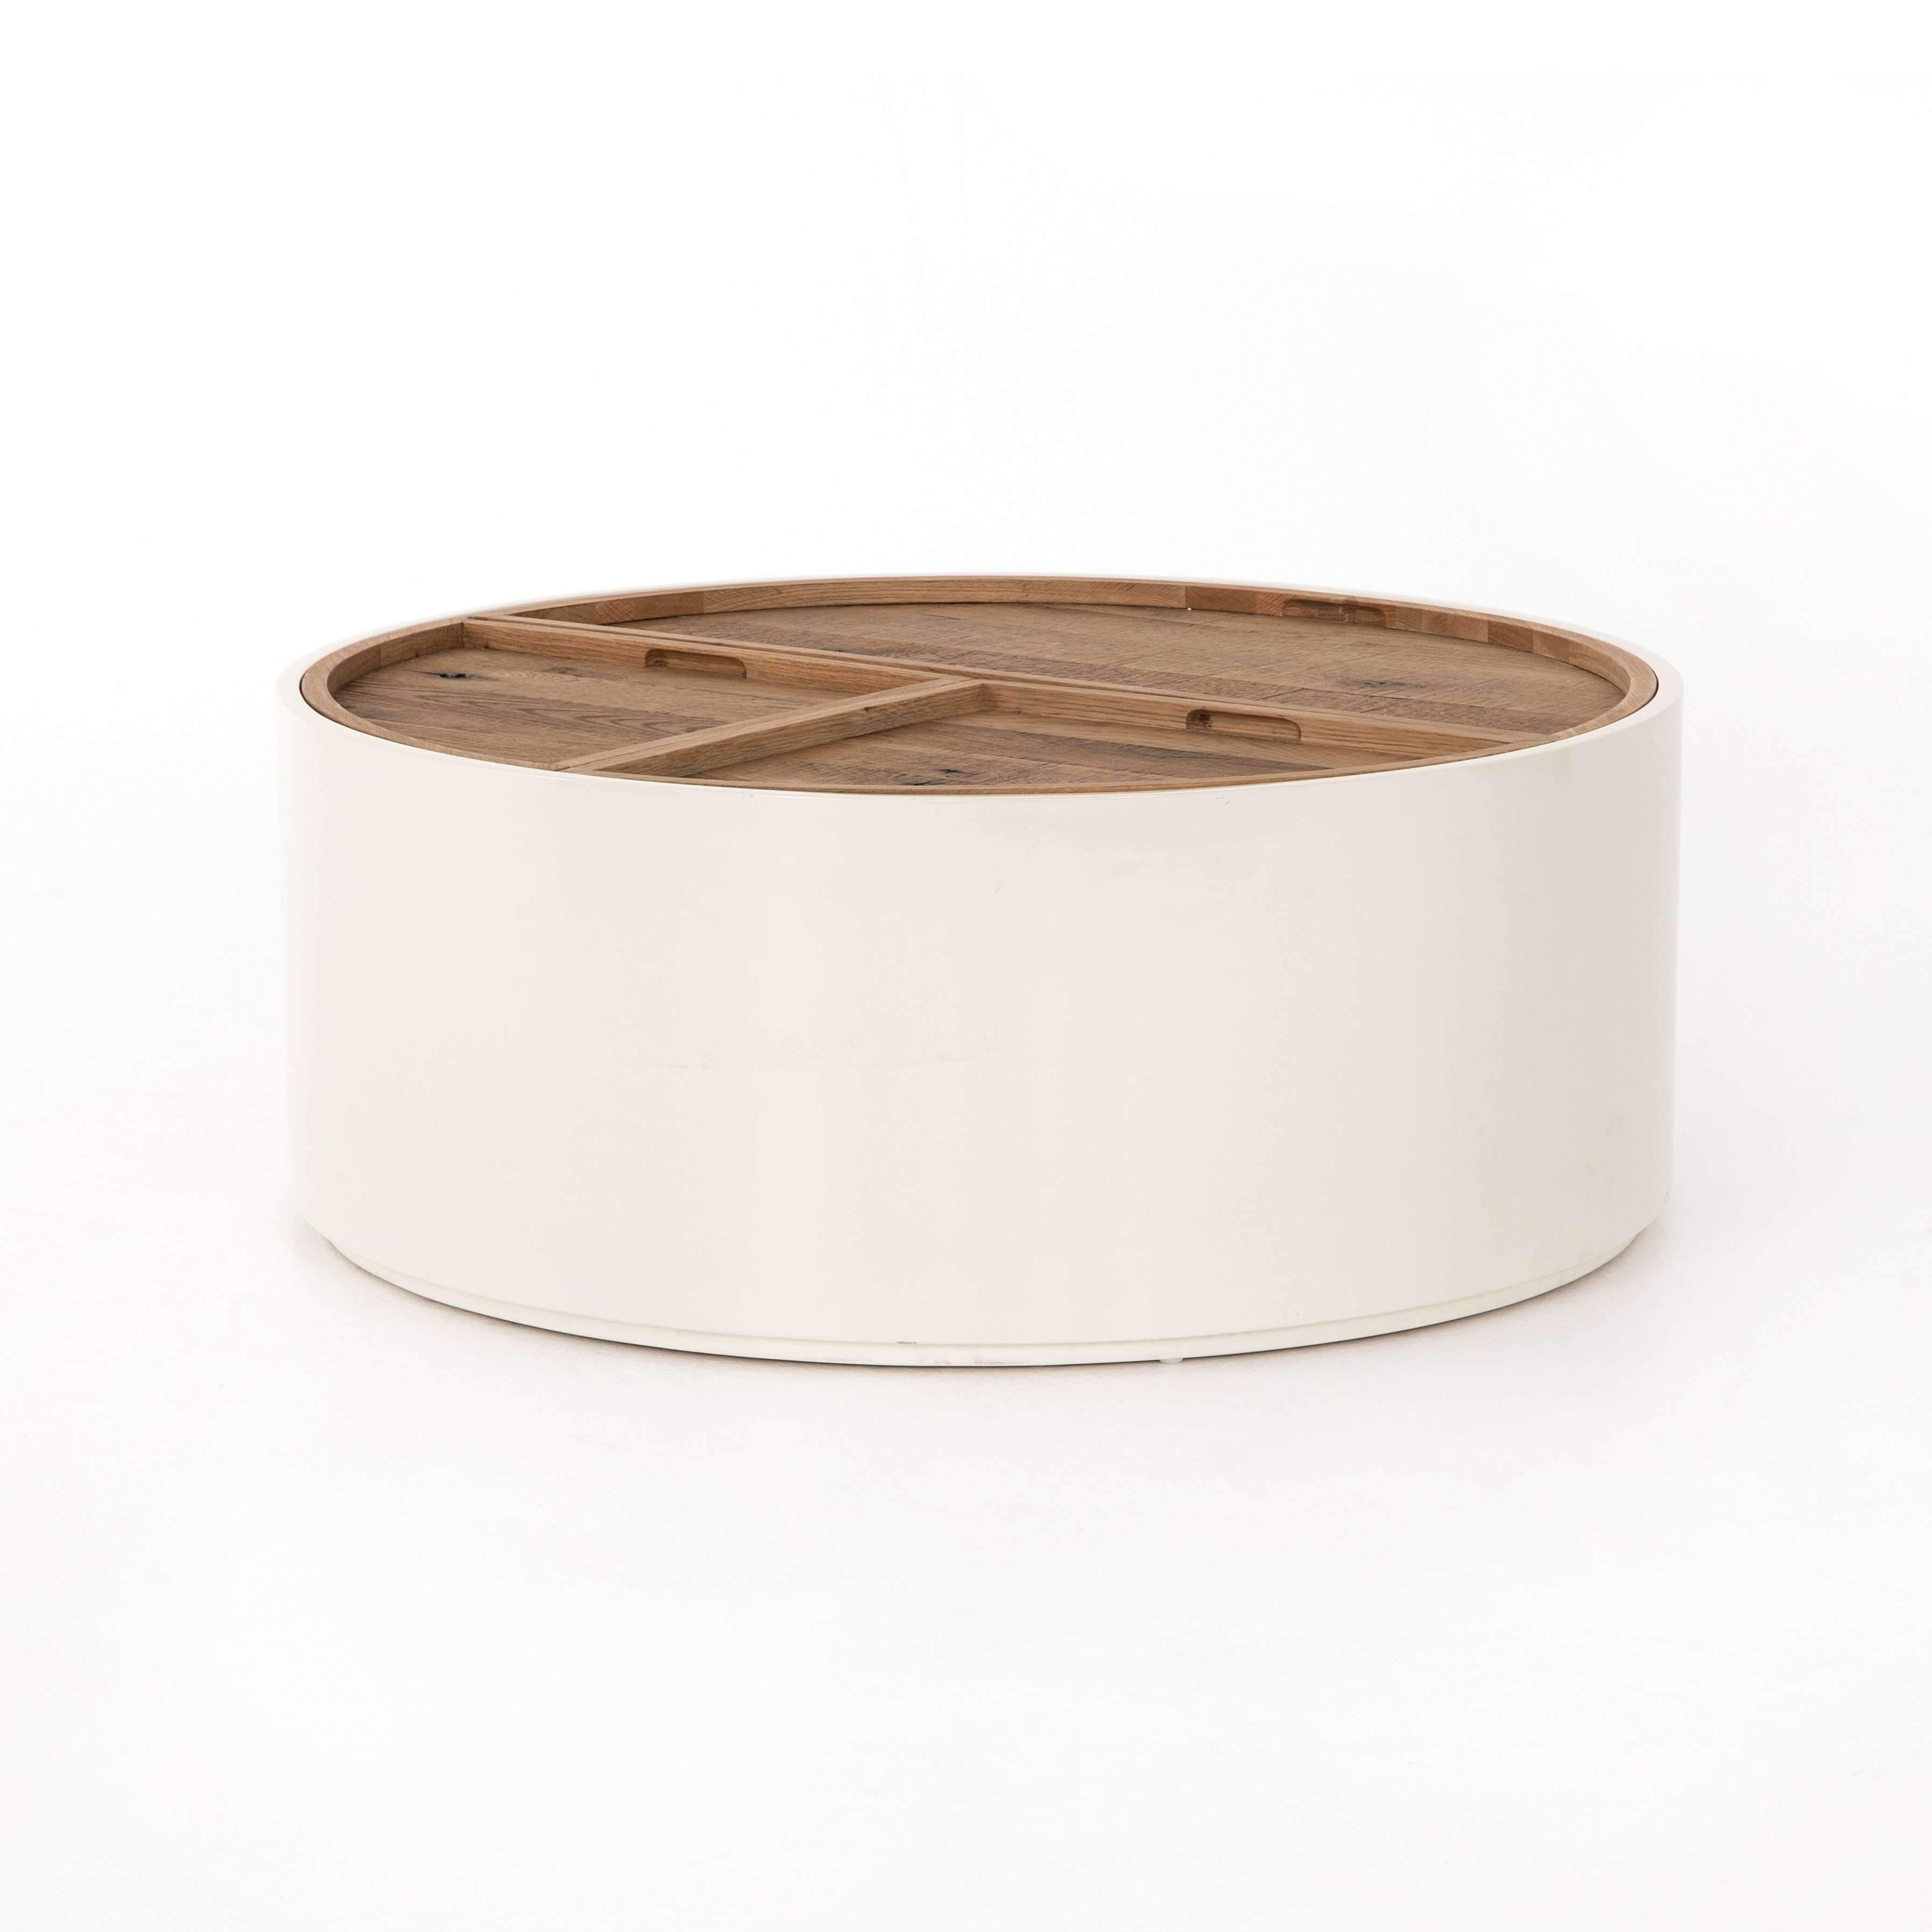 Cas Drum Coffee Tabledefault Title In 2020 Drum Coffee Table Coffee Table Drum Room [ 3590 x 3590 Pixel ]